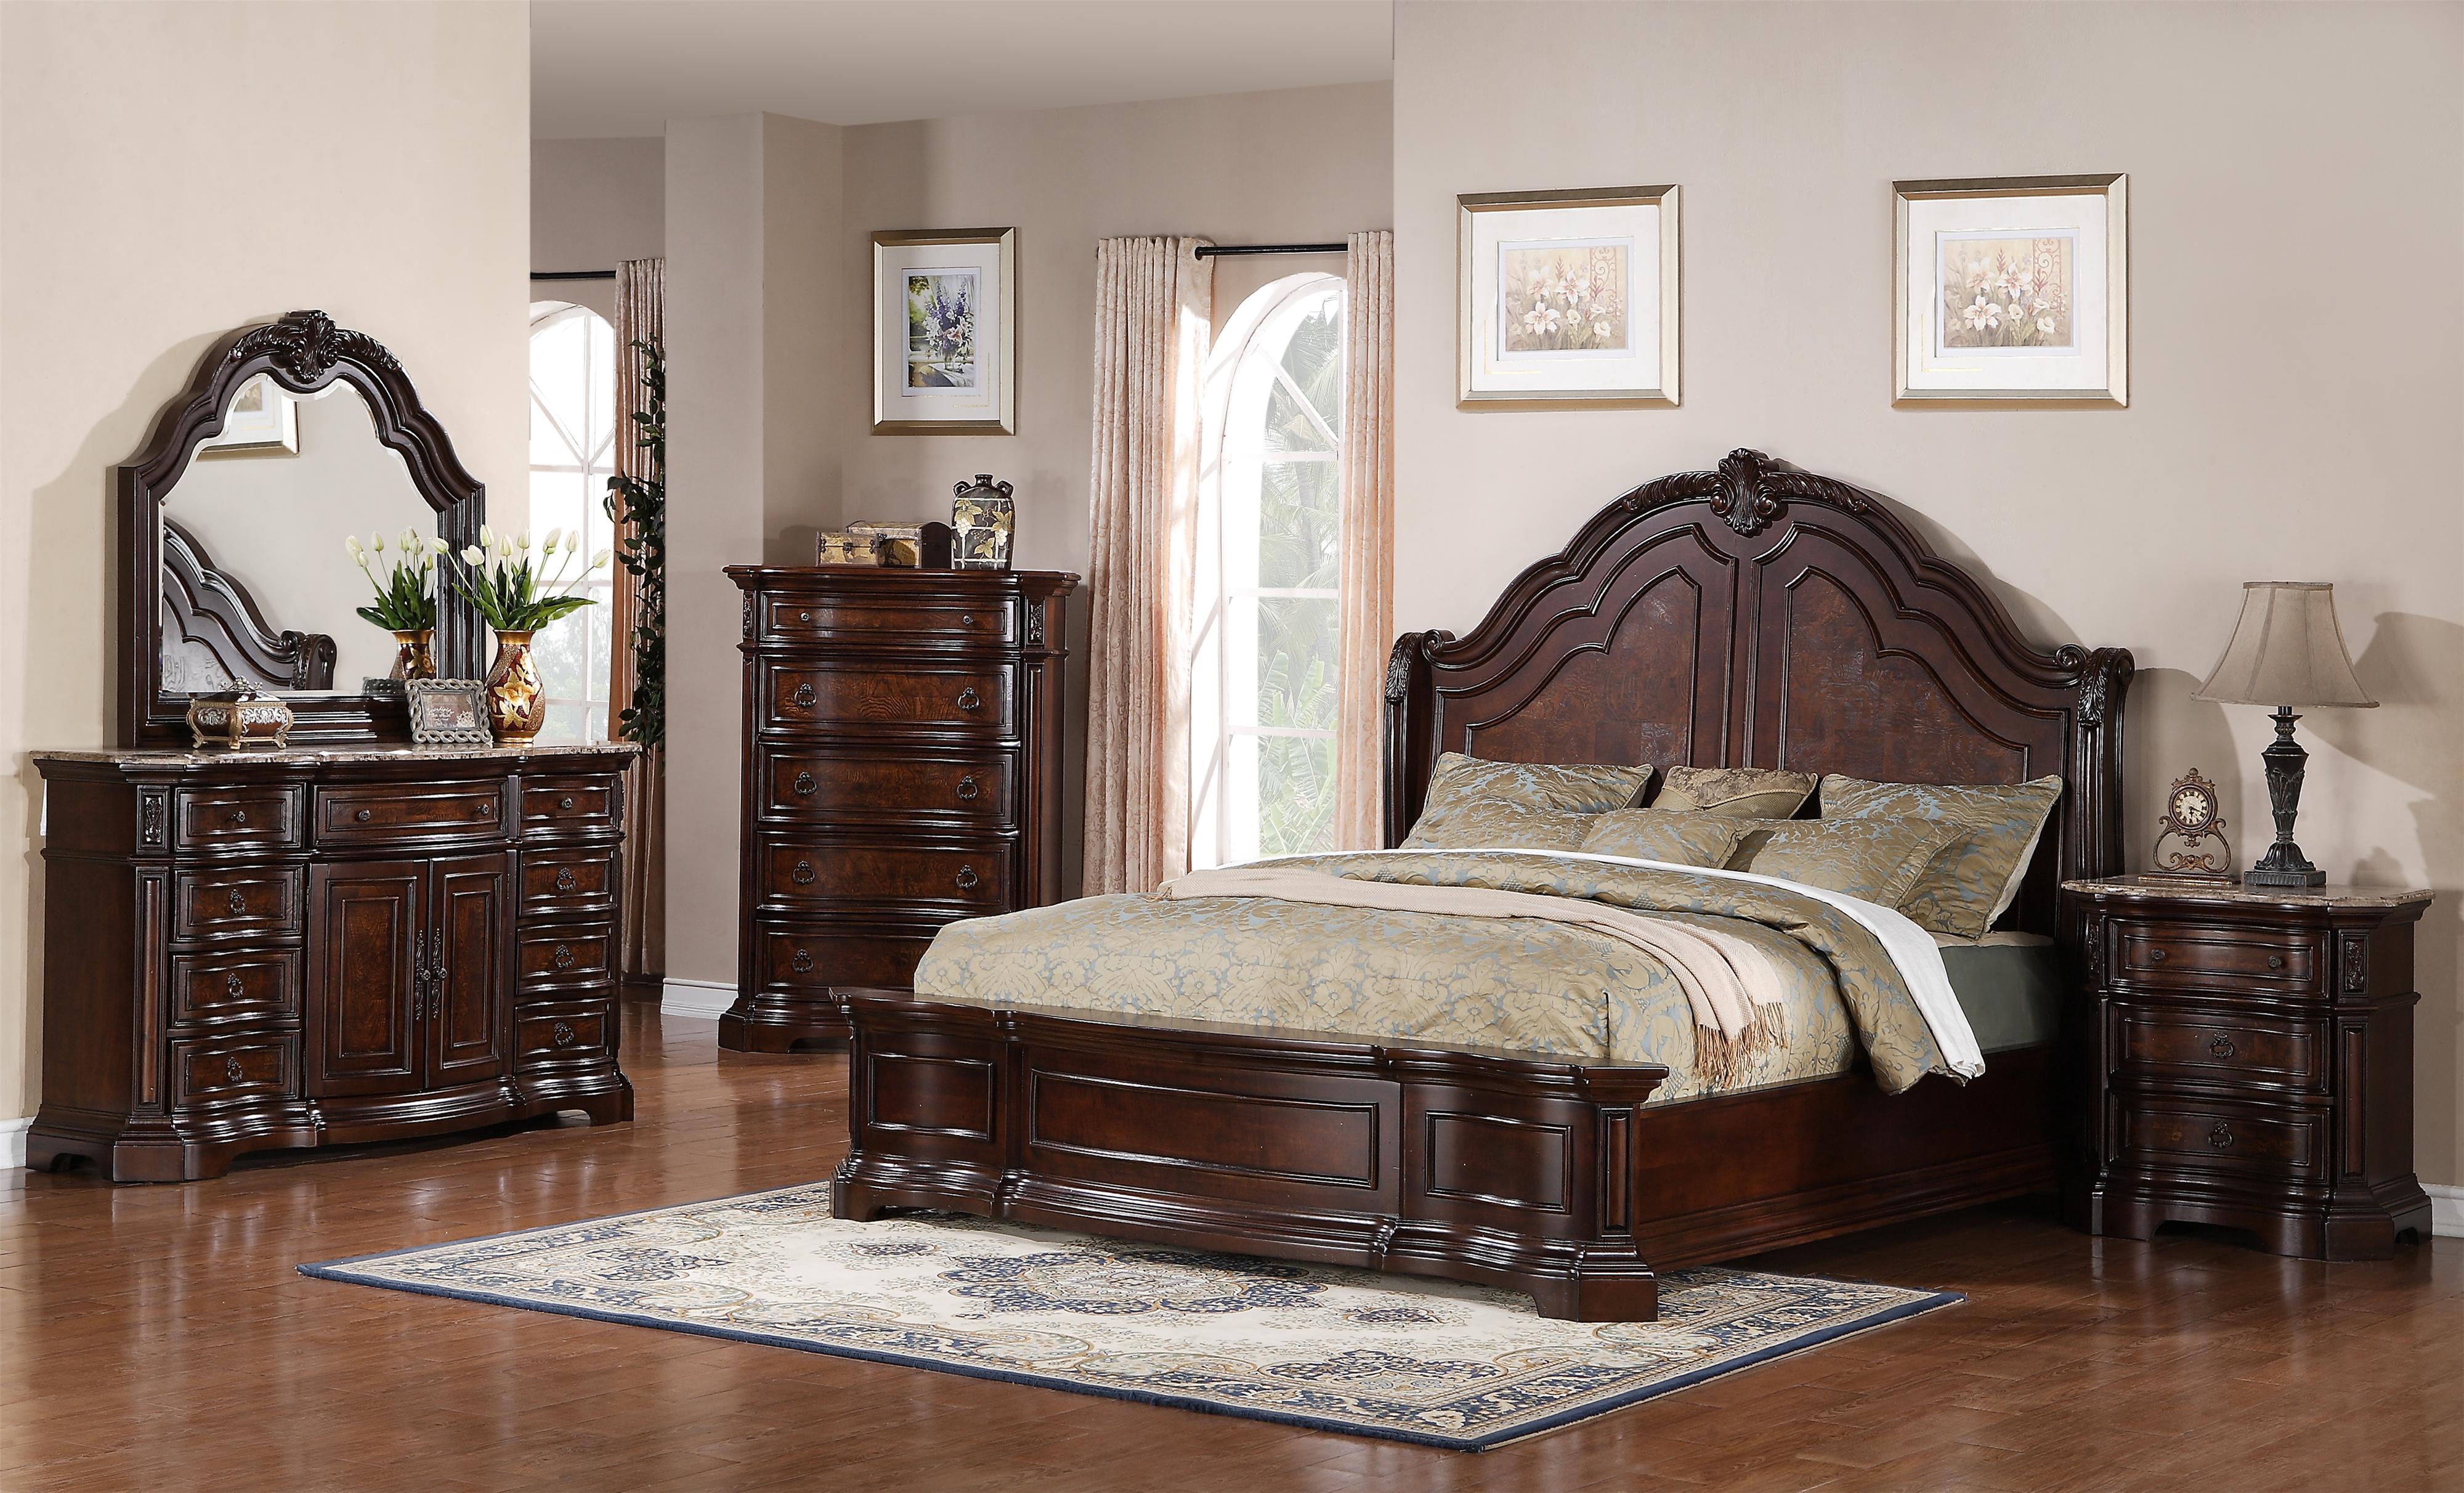 Samuel Lawrence Edington Queen Bedroom Group - Item Number: 8328 Q Bedroom Group 2